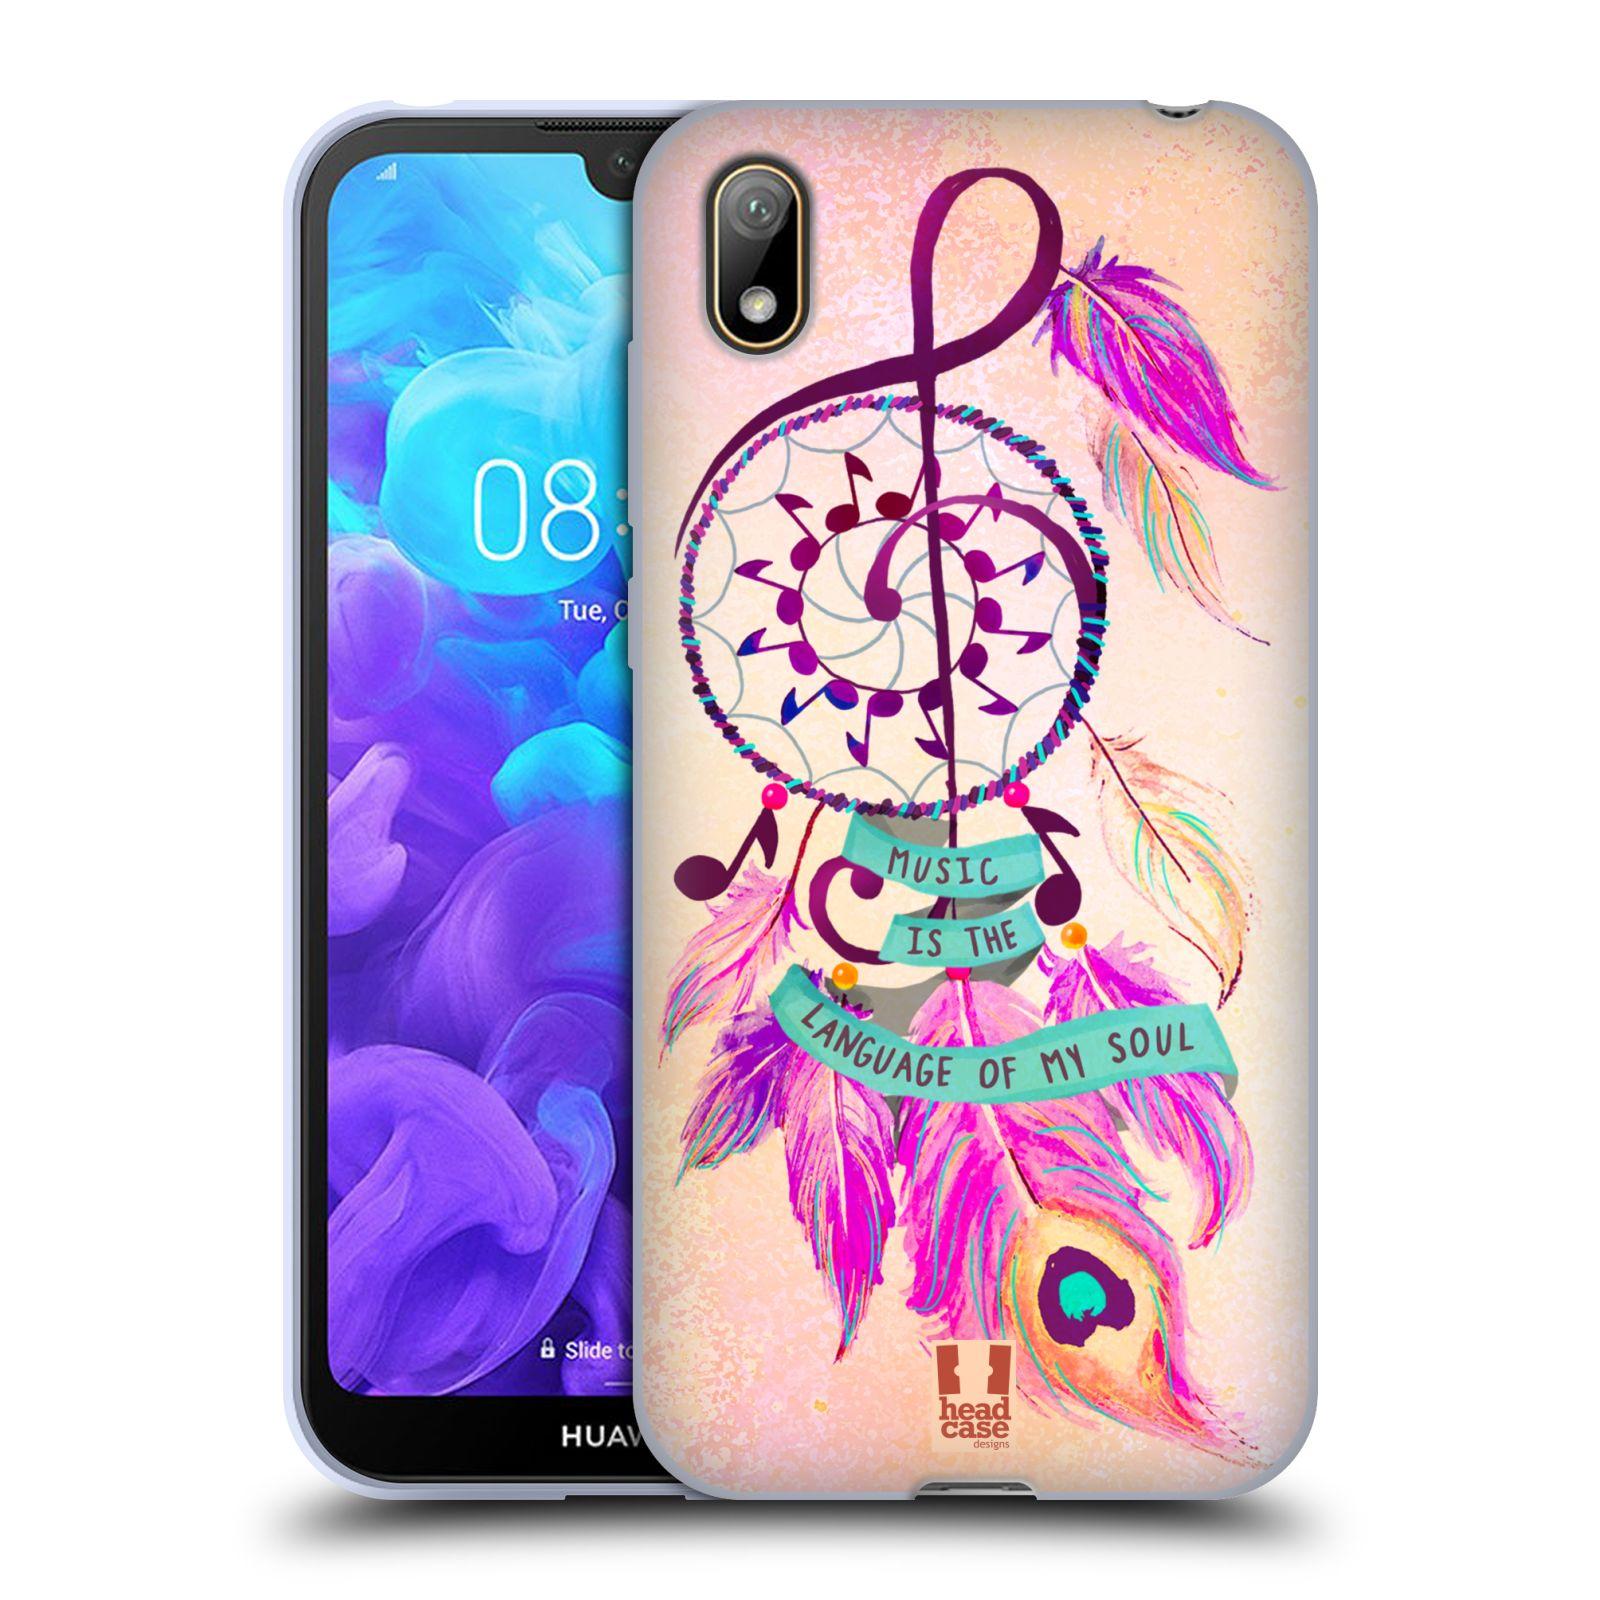 Silikonové pouzdro na mobil Huawei Y5 (2019) - Head Case - Lapač Assorted Music